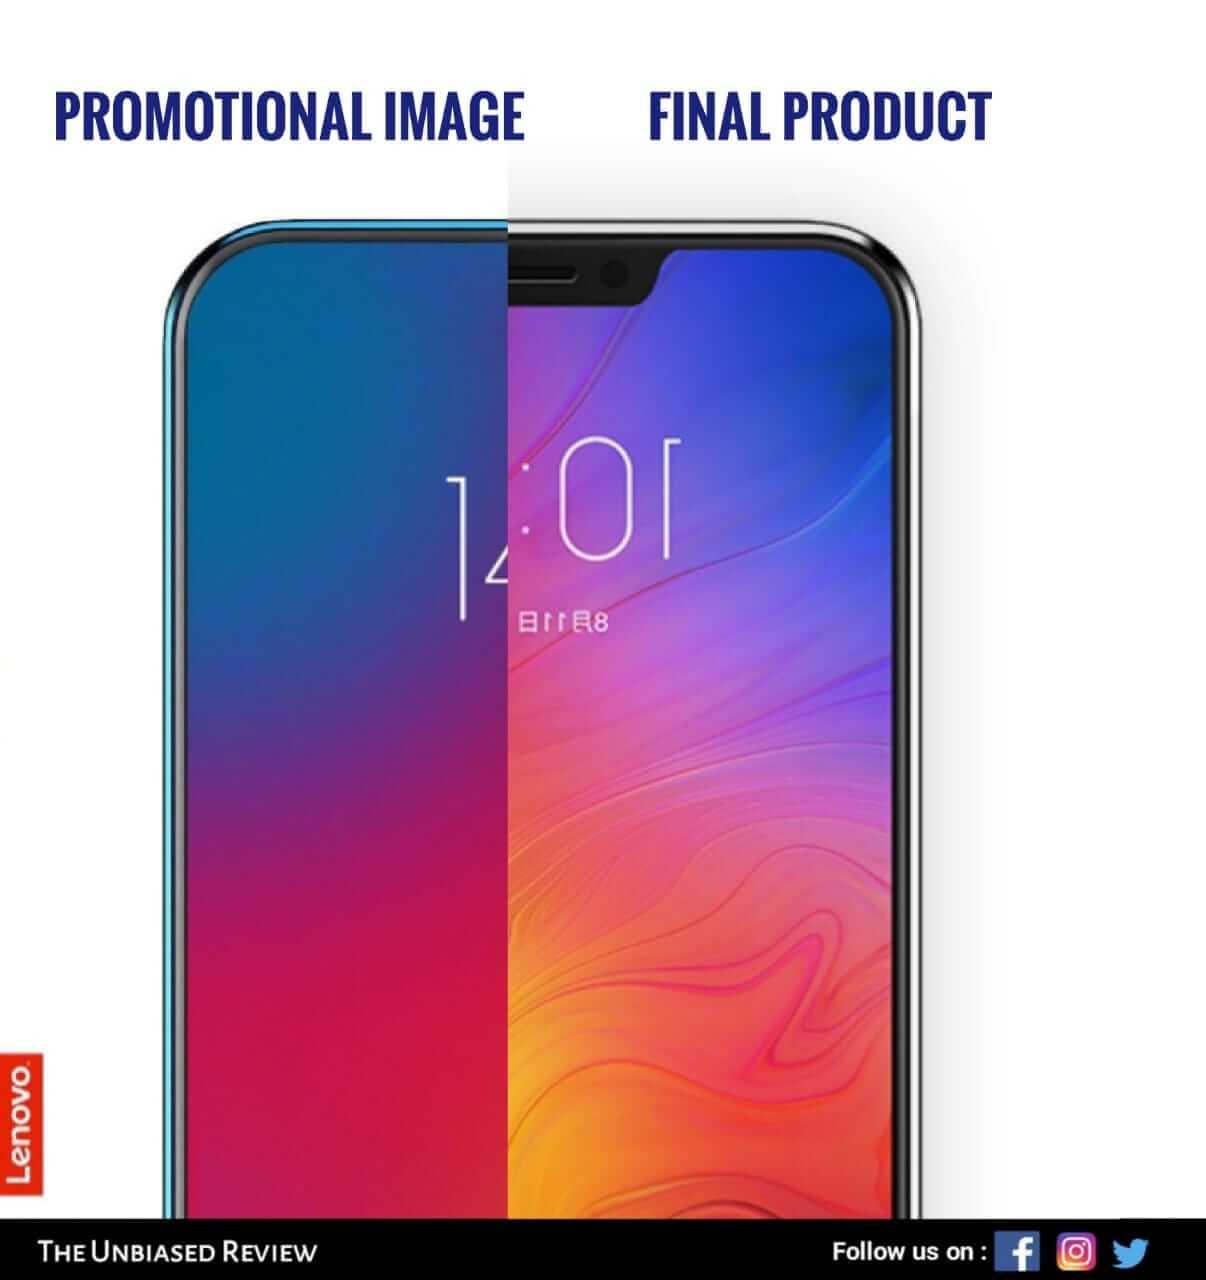 Lenovo, lenovo z5, lenovo z5 smartphone, lenovo z5 price, lenovo z5 notch, lenovo z5 specs, lenovo z5 storage, lenovo z5 features, lenovo z5 india launch date, z5 smartphone